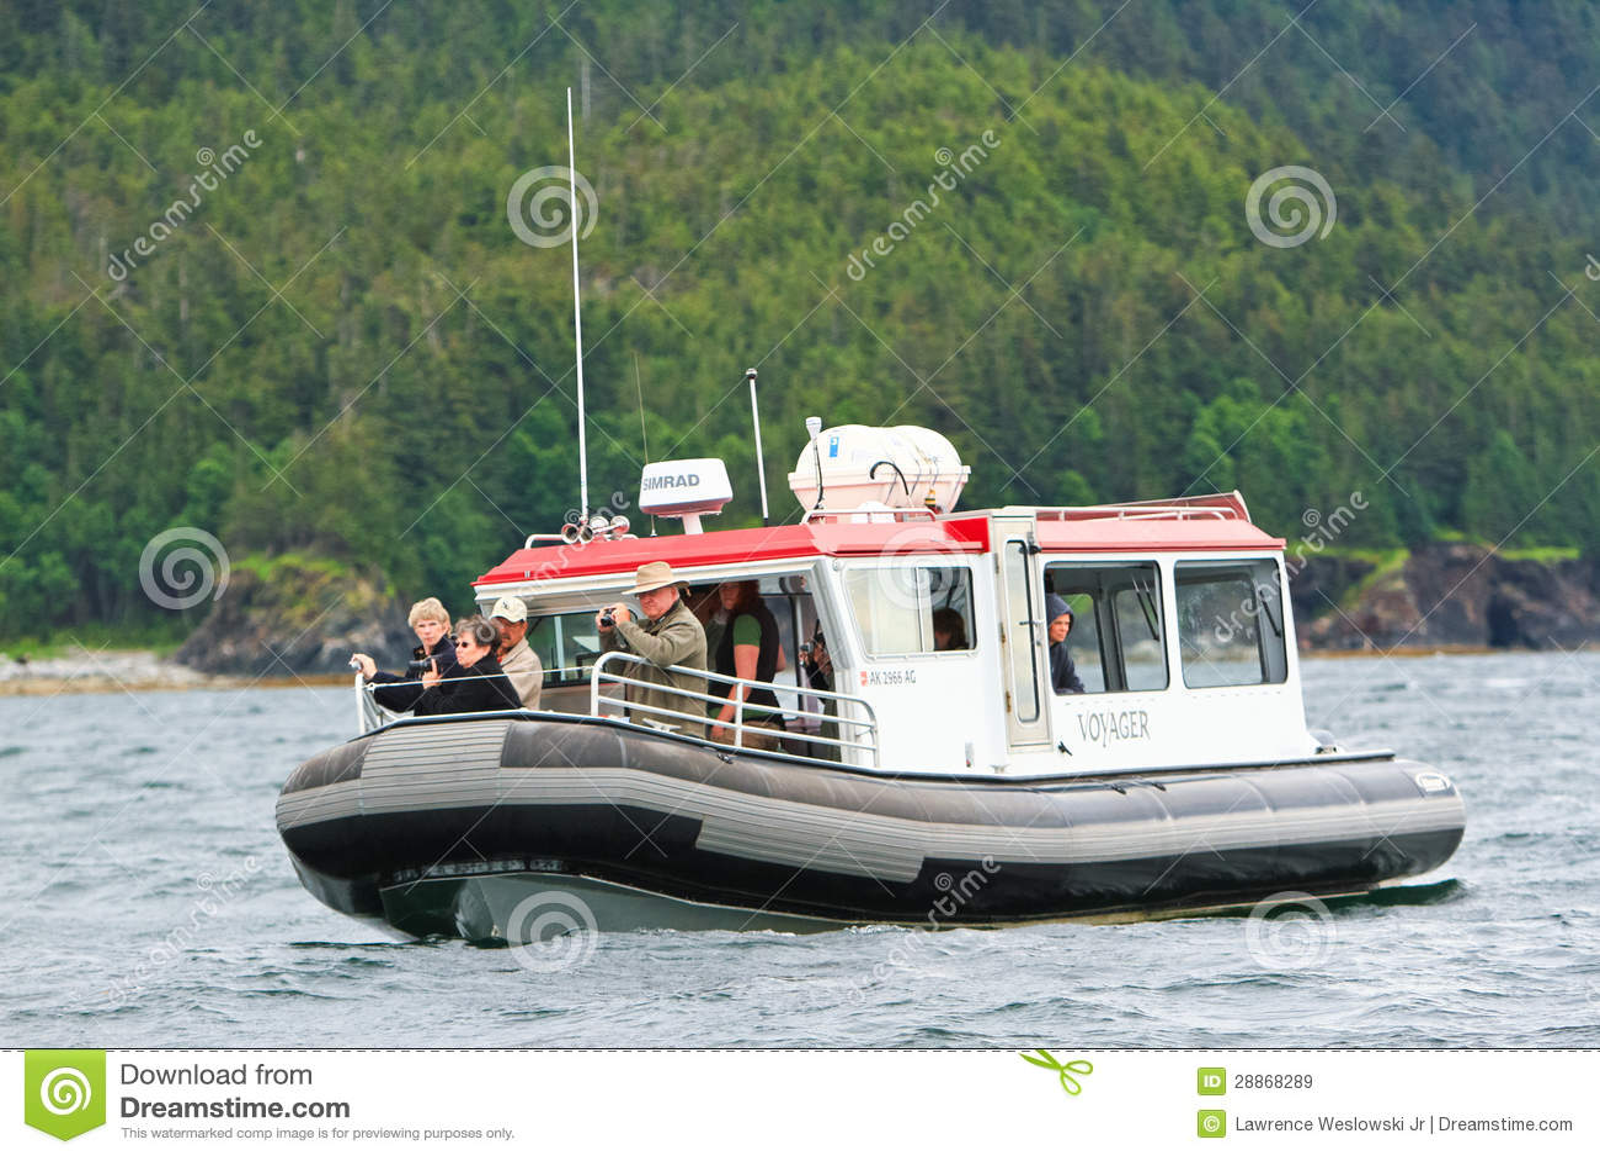 Alaska Whale Watching Boat Auke Bay Juneau Editorial Photo Cartoondealer Com 28868331